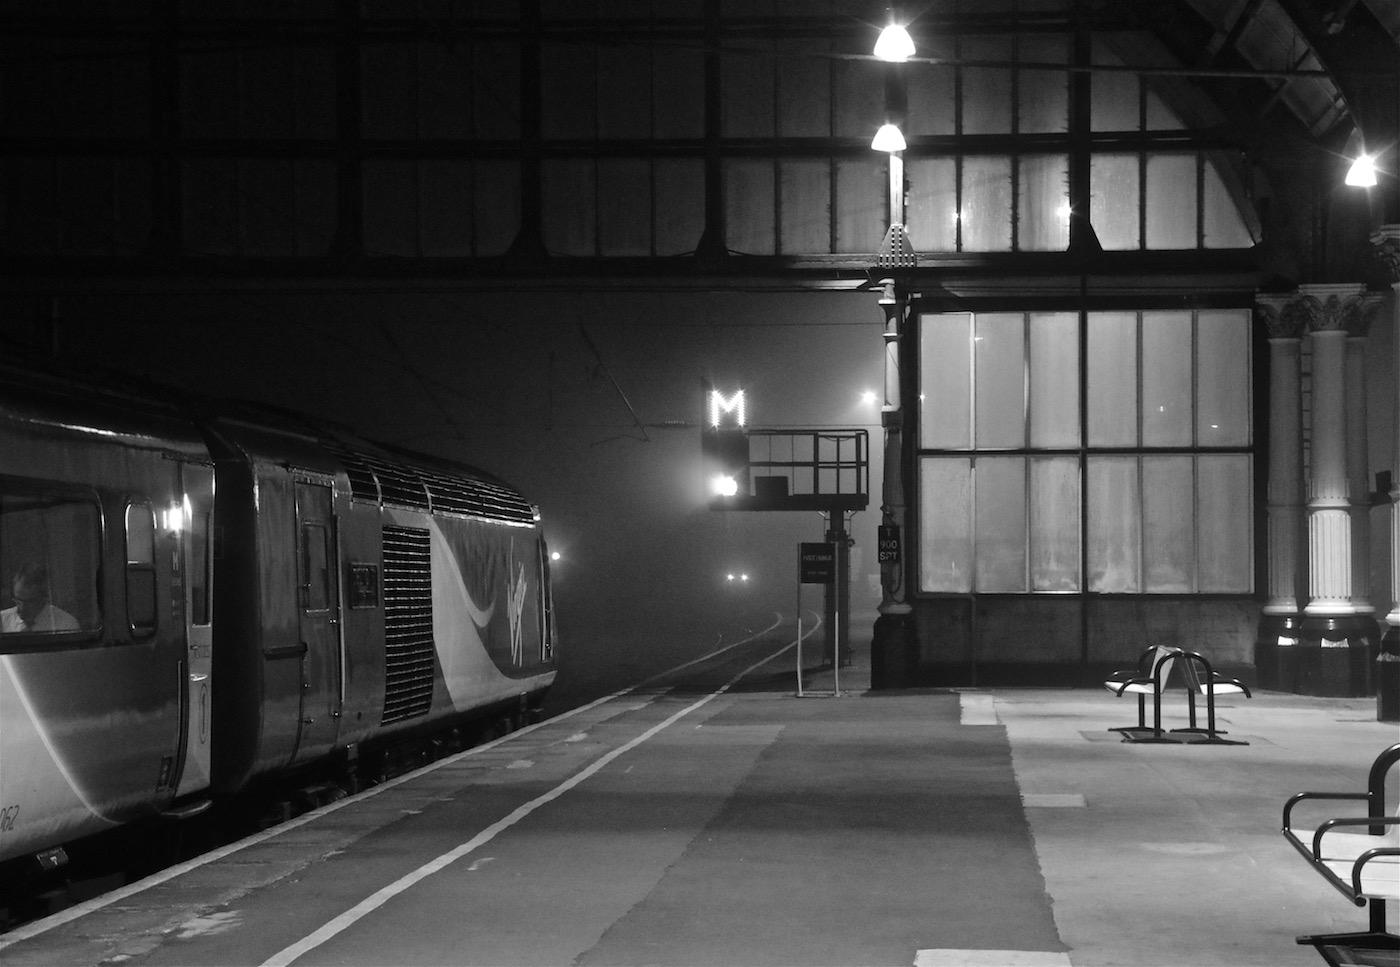 Darlington Station